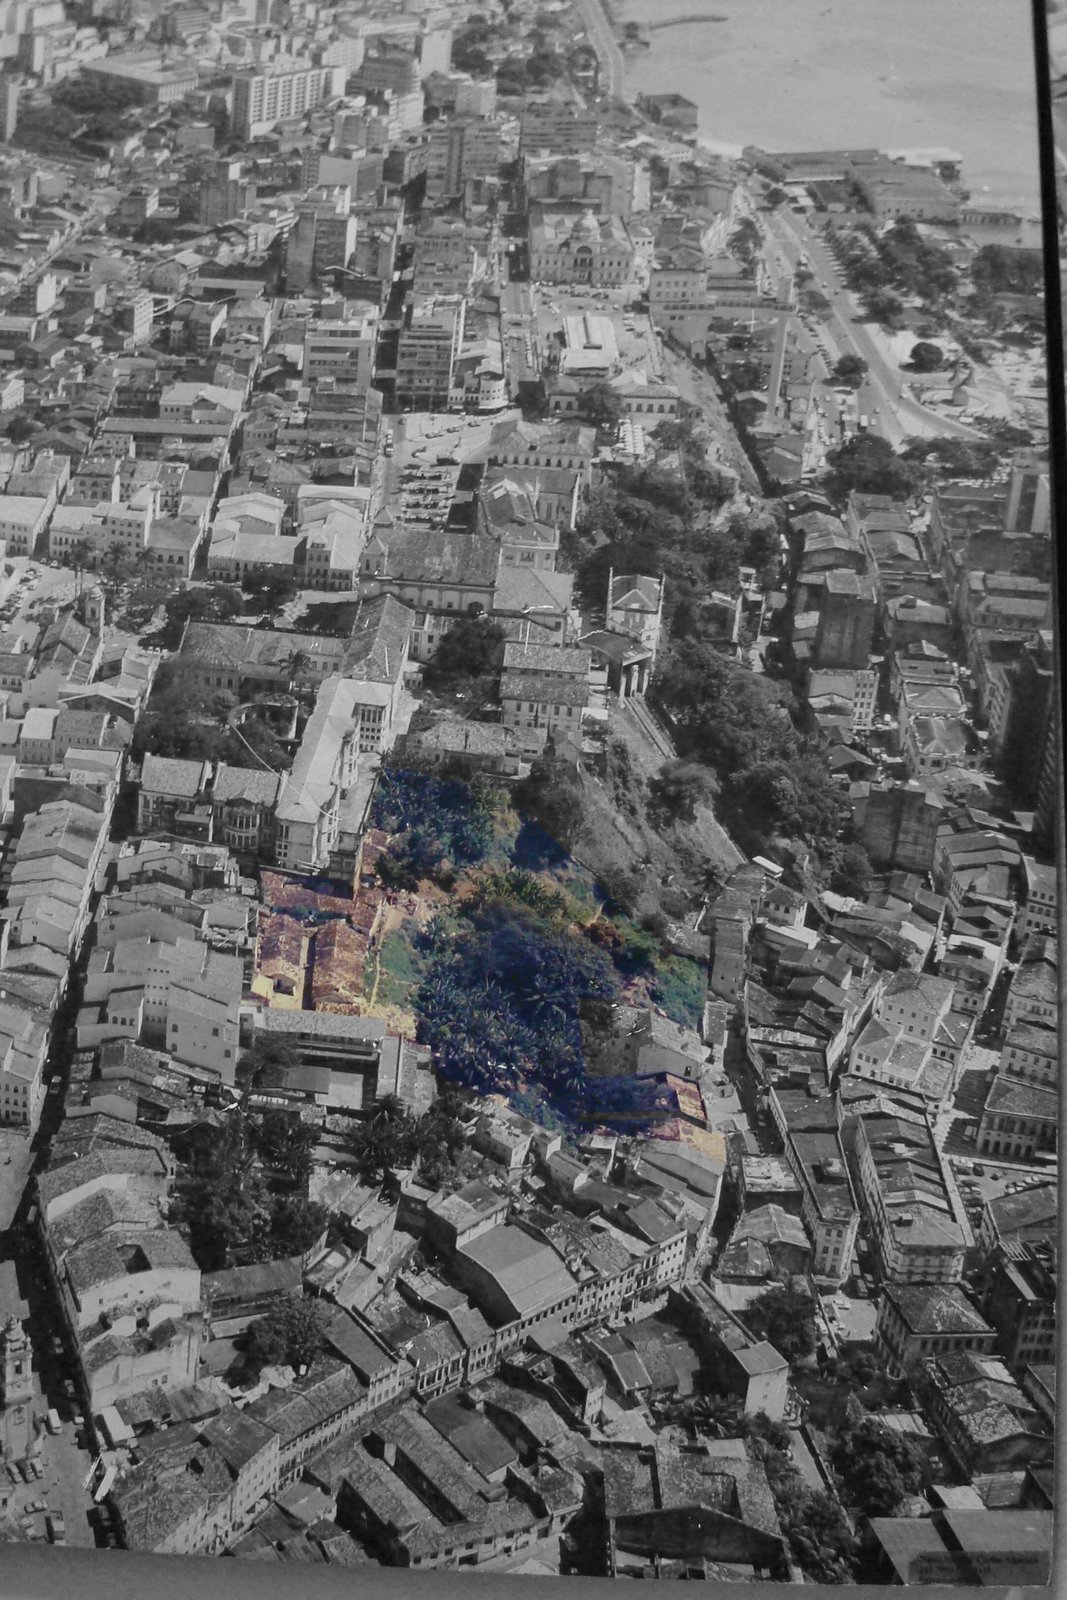 Vila esperana poligonal2.jpg